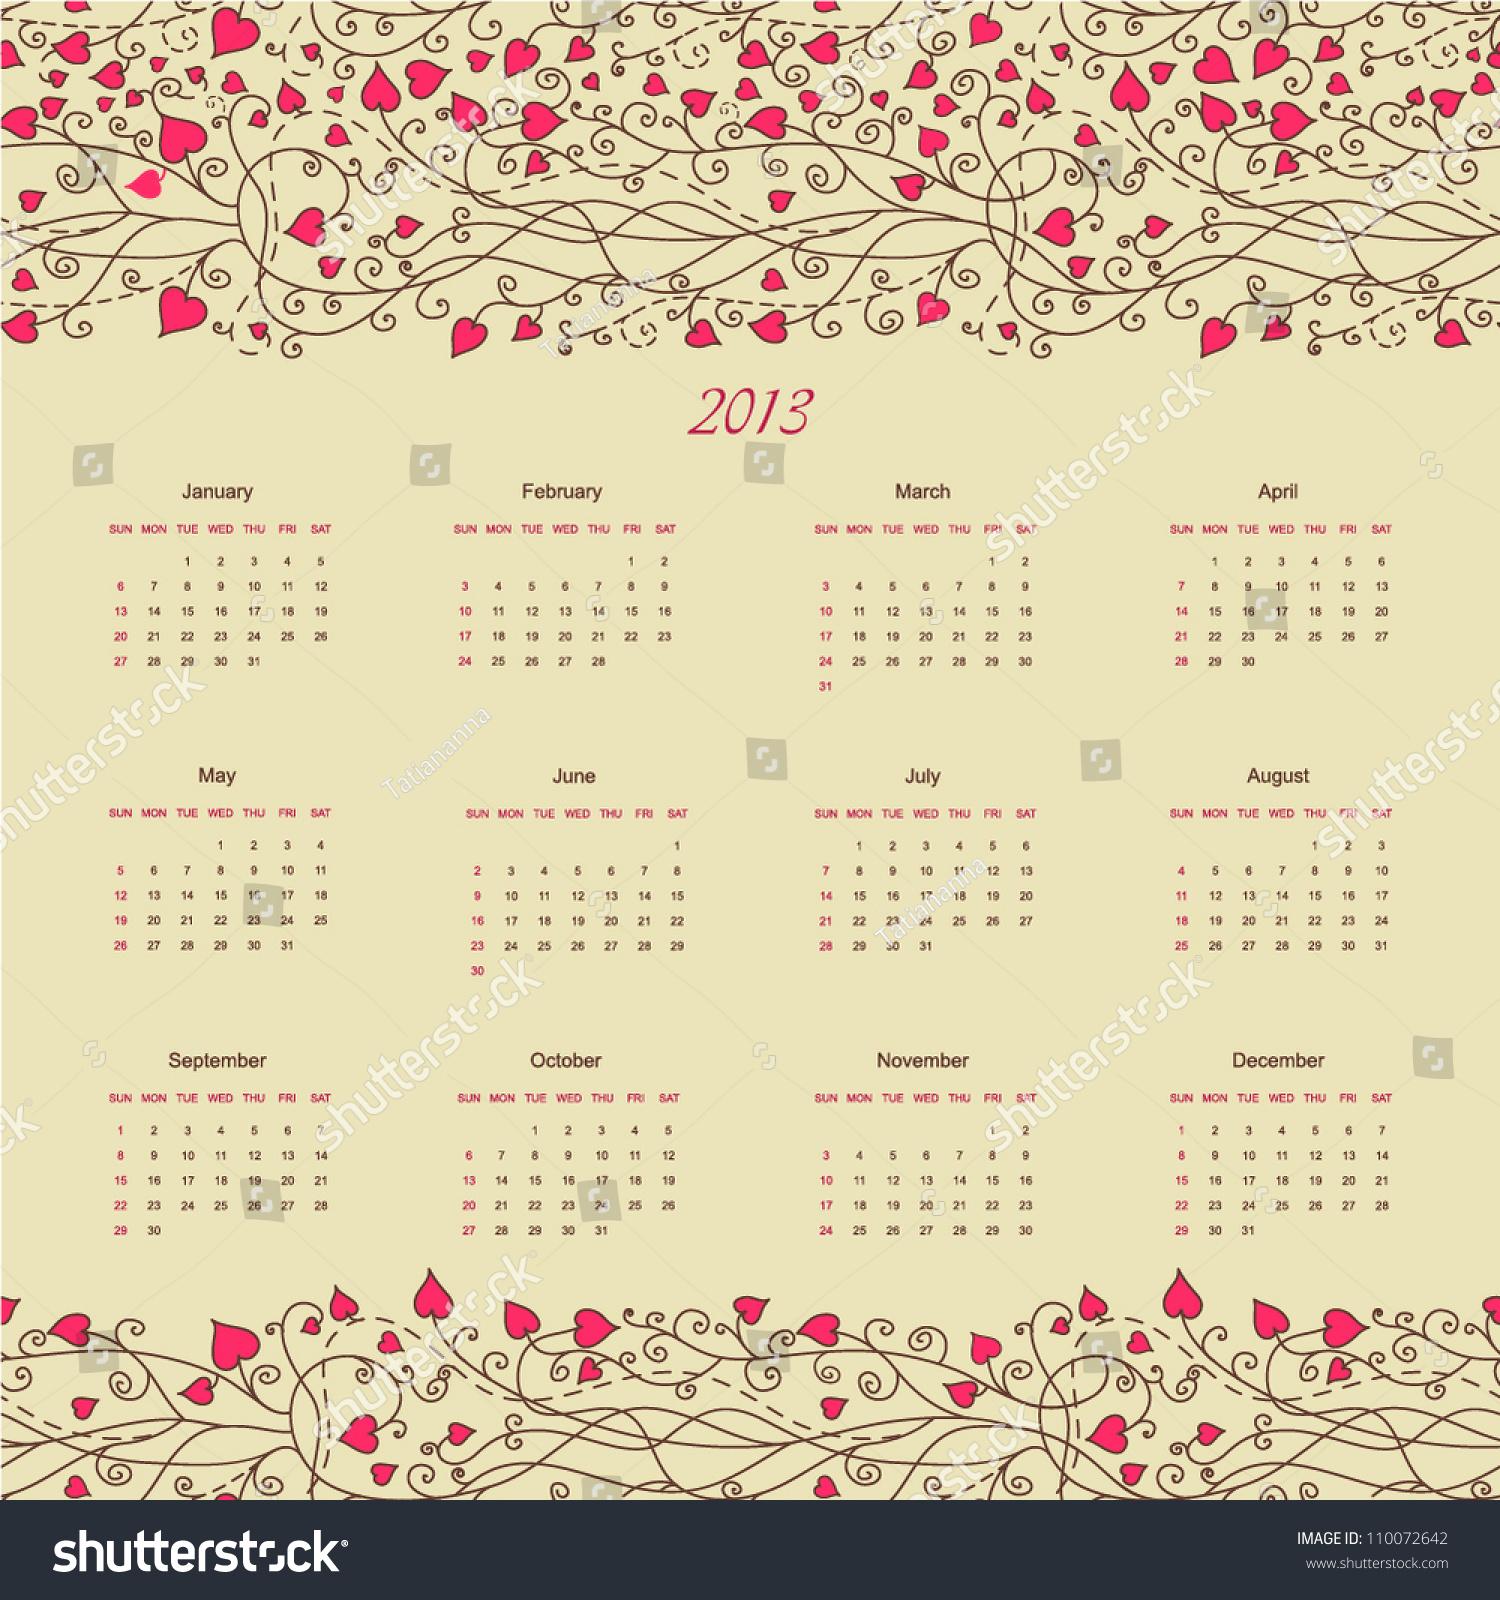 Calendar Design Drawing : Calendar new year hand drawing floral retro